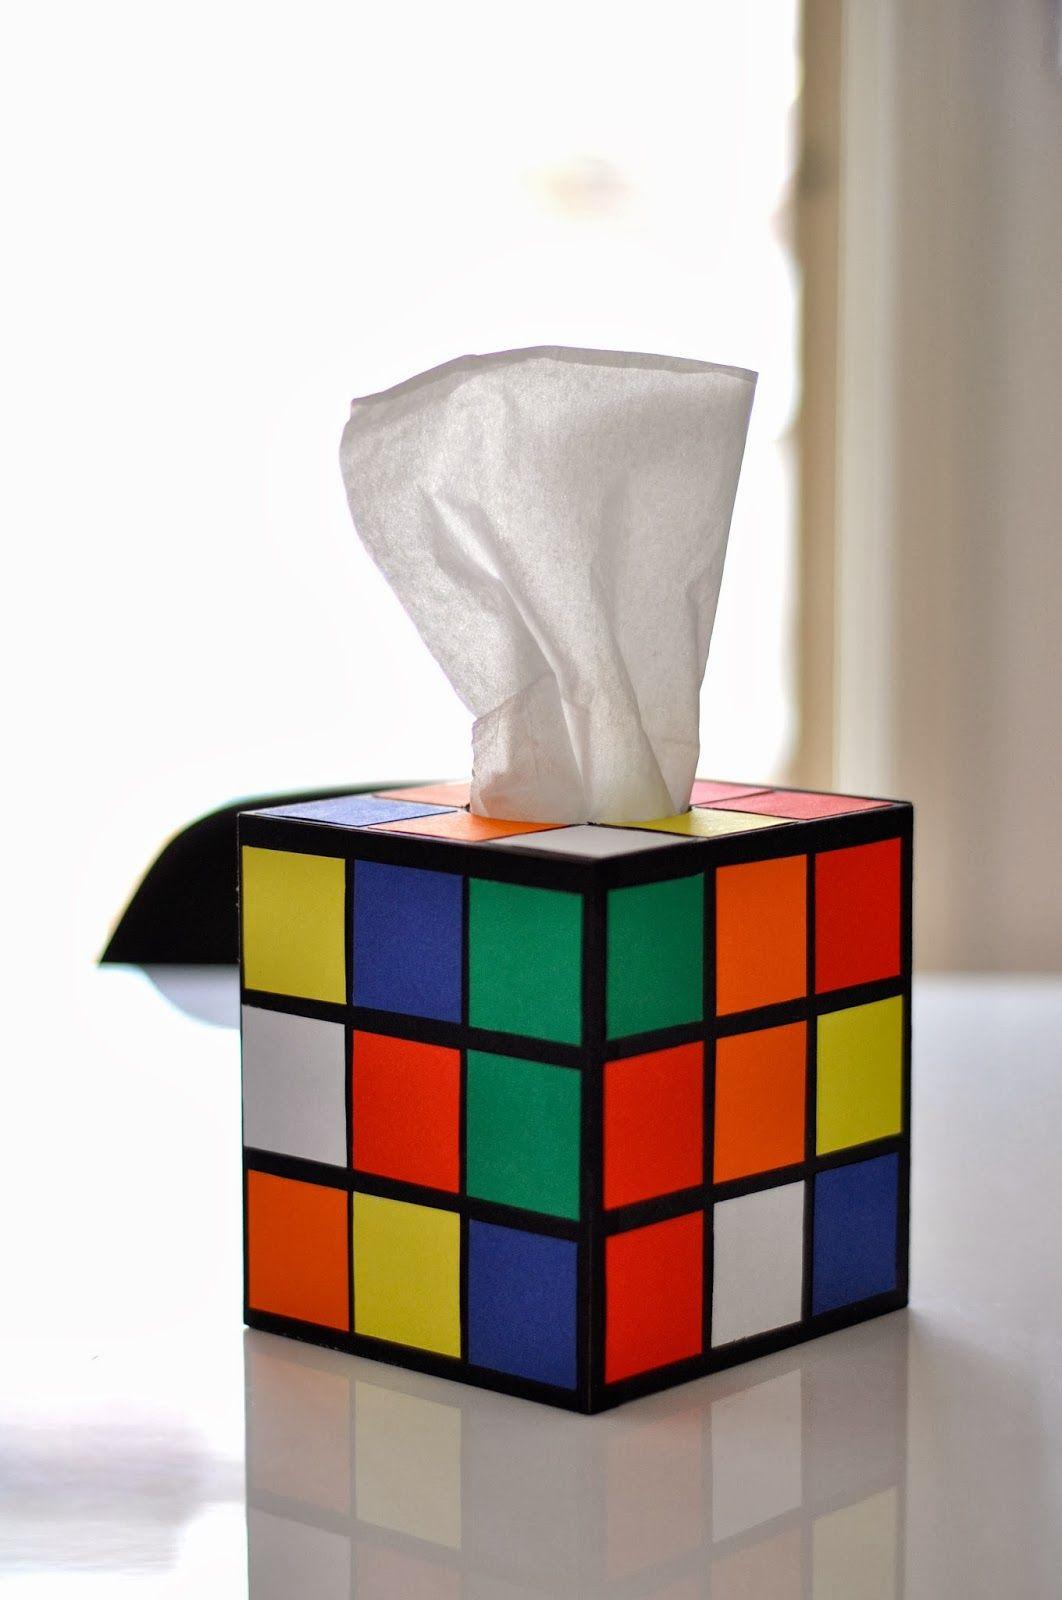 Diy rubik 39 s cube tissue box cover craft diy for Tissue box cover craft